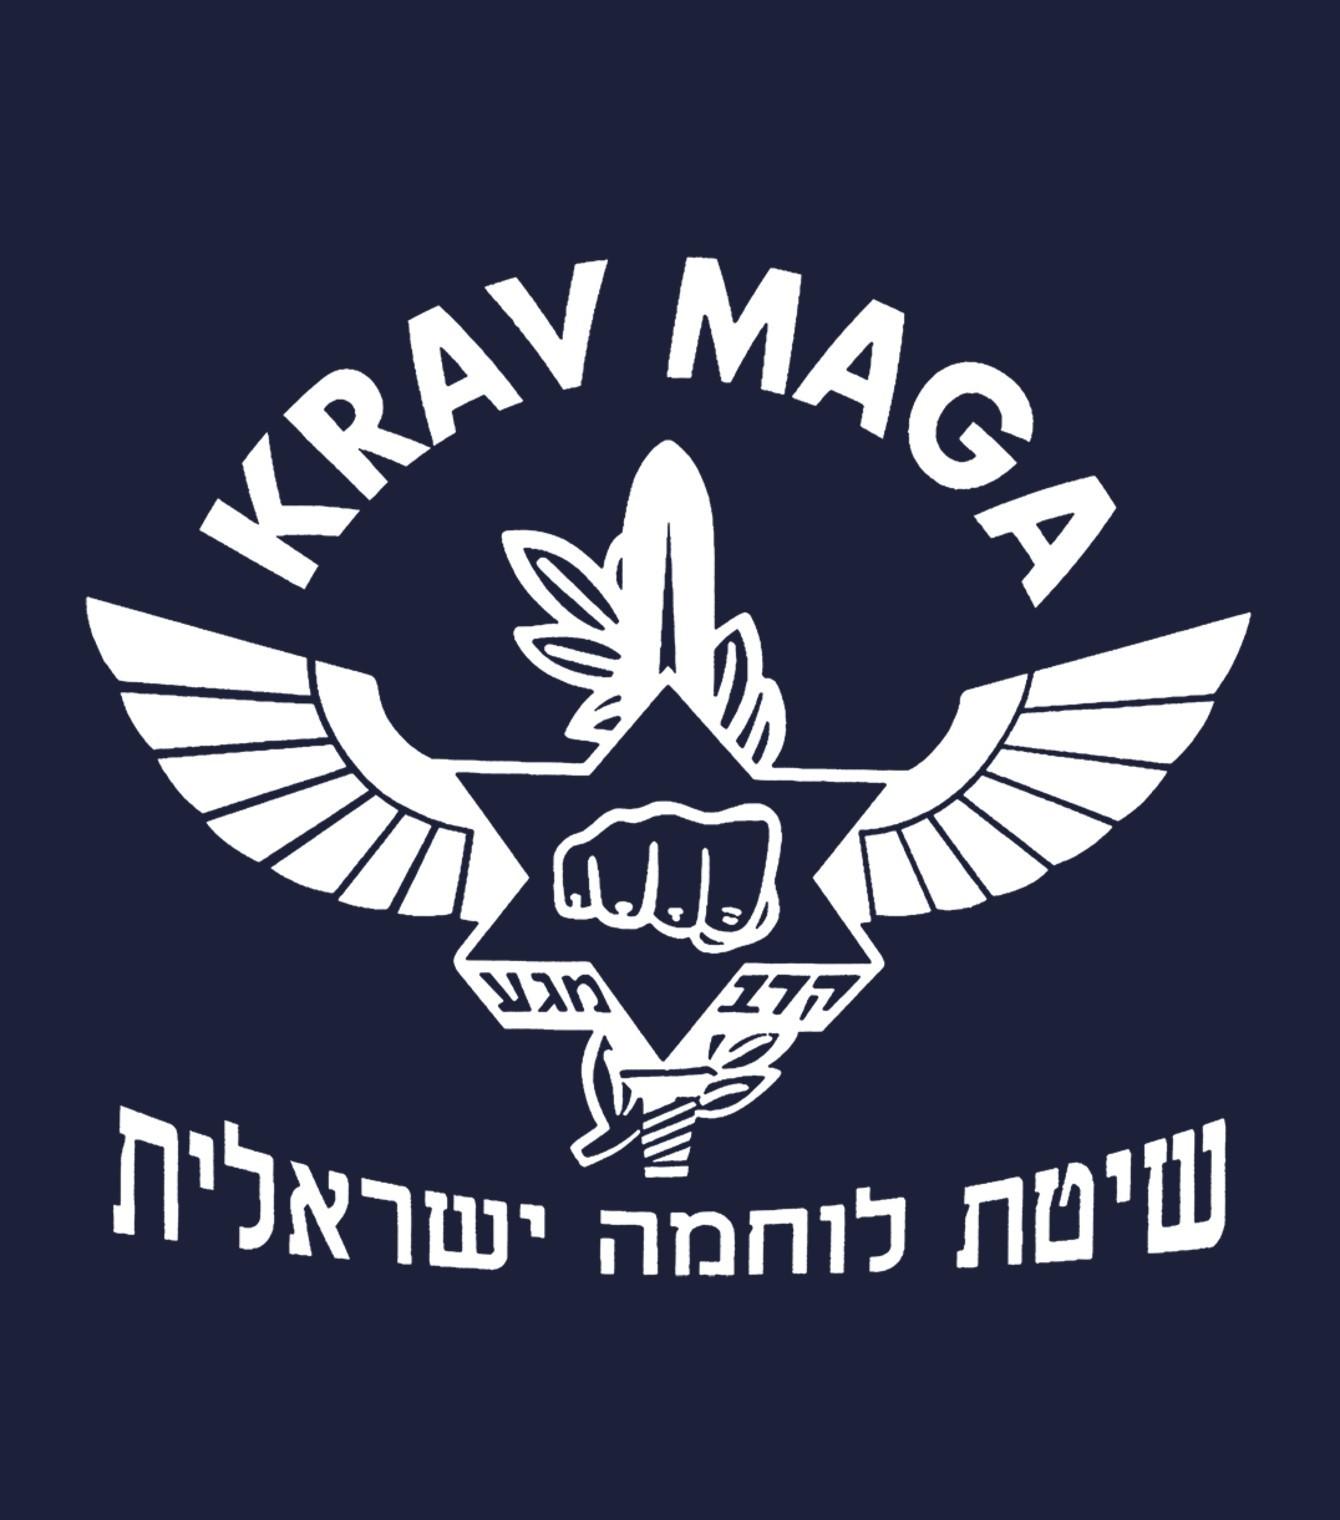 krav maga wings israel close combat training hebrew passover clip art for free passover clip art images